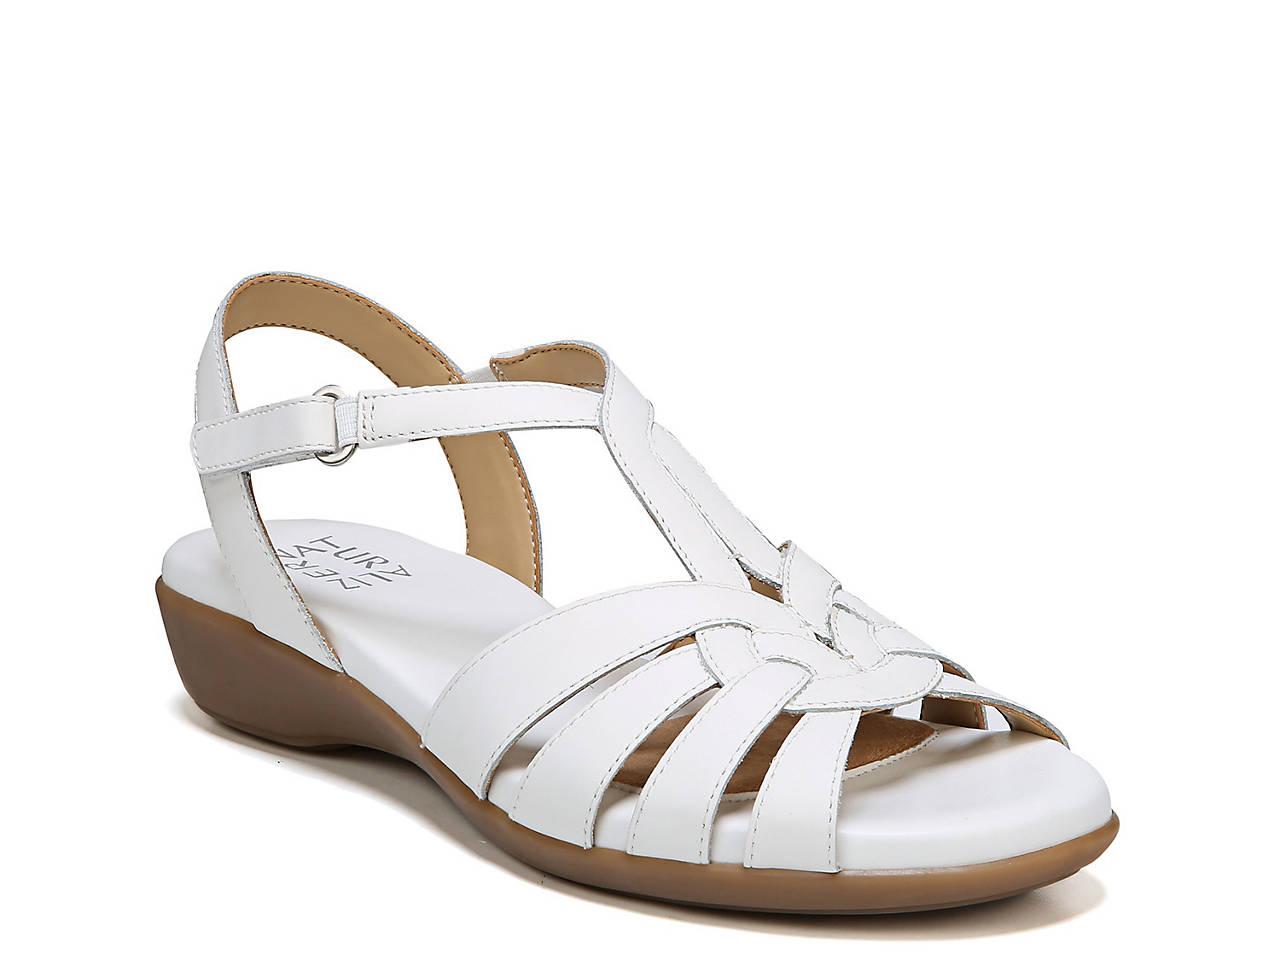 c281017ccc68 Naturalizer Namora Sandal Women s Shoes